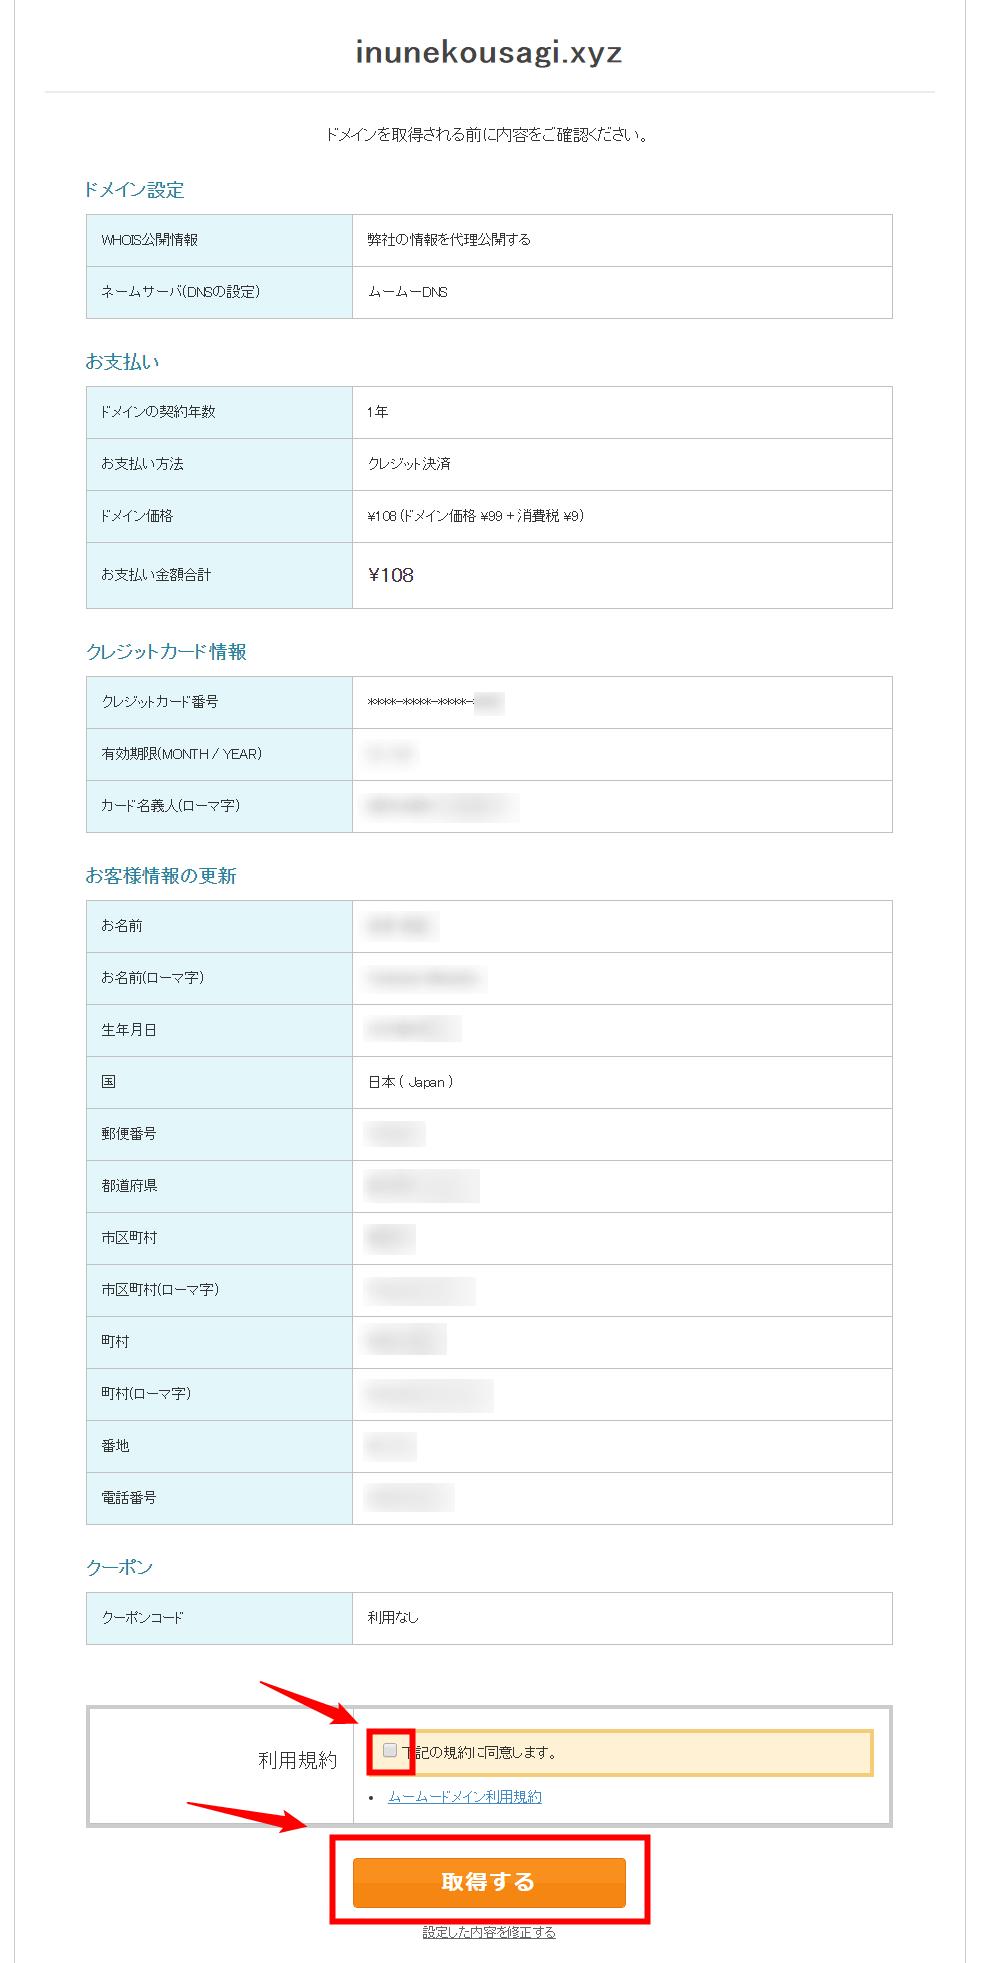 WordPressのドメインを取得する方法【ムームードメインで解説】